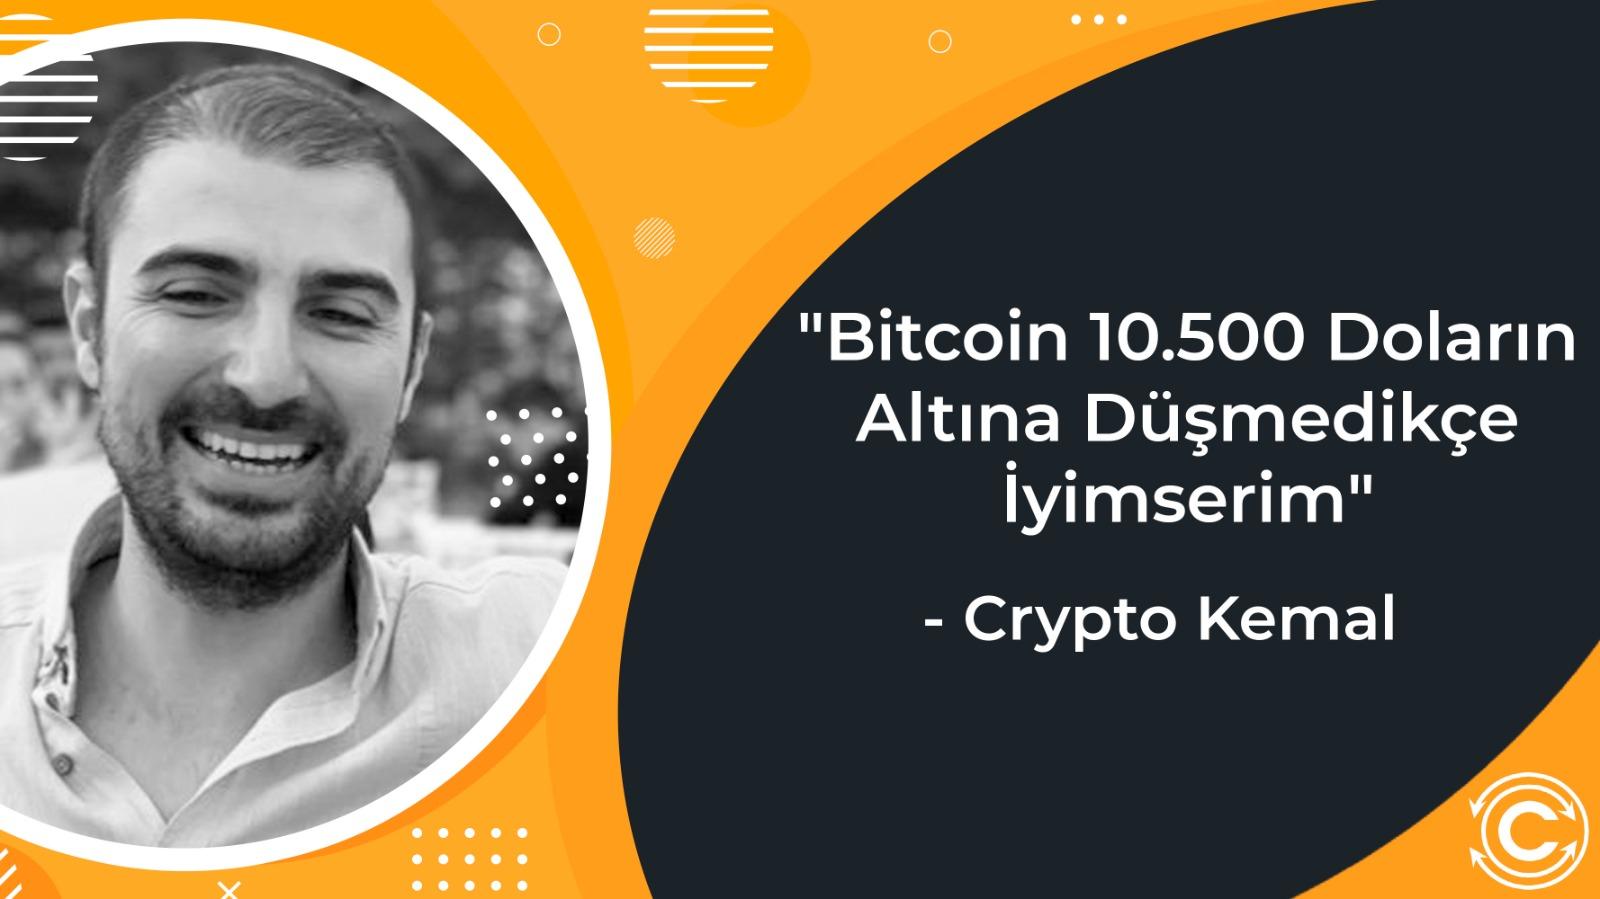 Crypto Kemal Bitcoin 10.500 Dolarin Altina Dusmedikce Iyimserim